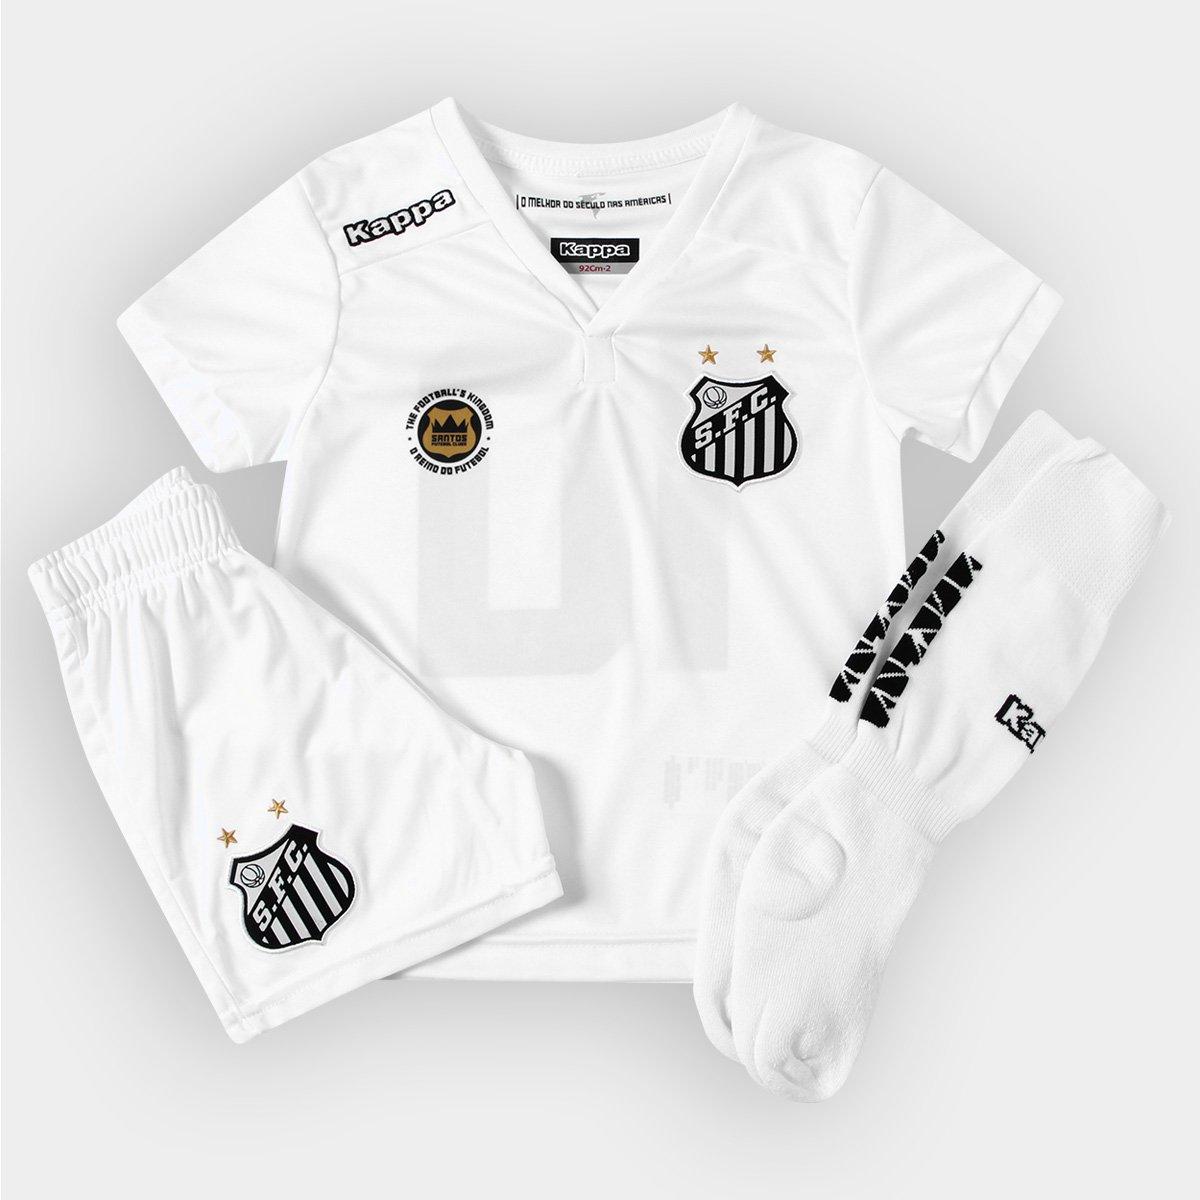 6cbc0e9eb4 Kit Kappa Santos I 2016 nº 10 - Infantil - Compre Agora